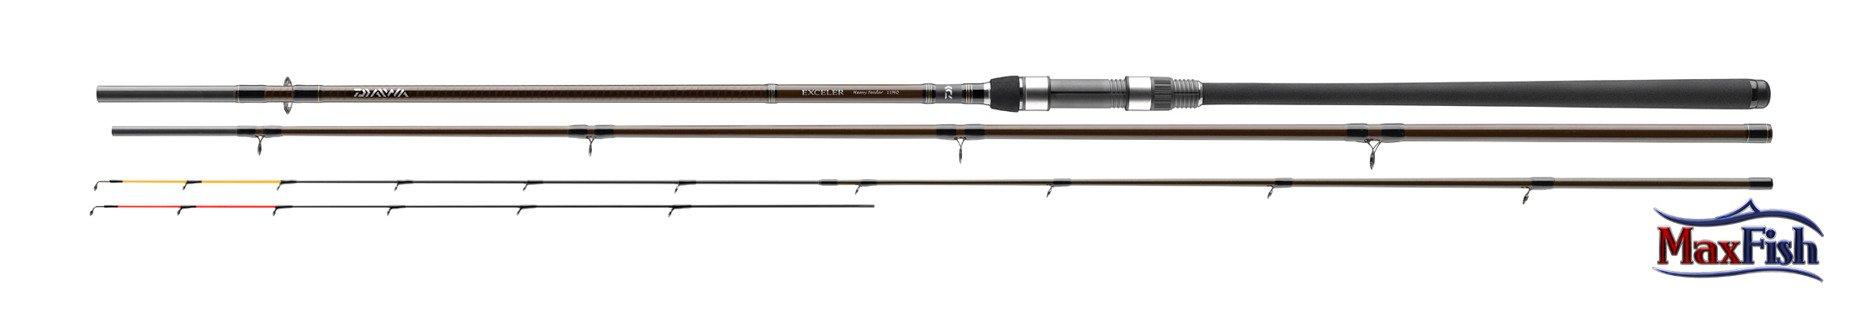 Daiwa Exceler Method Feeder  330cm 80g